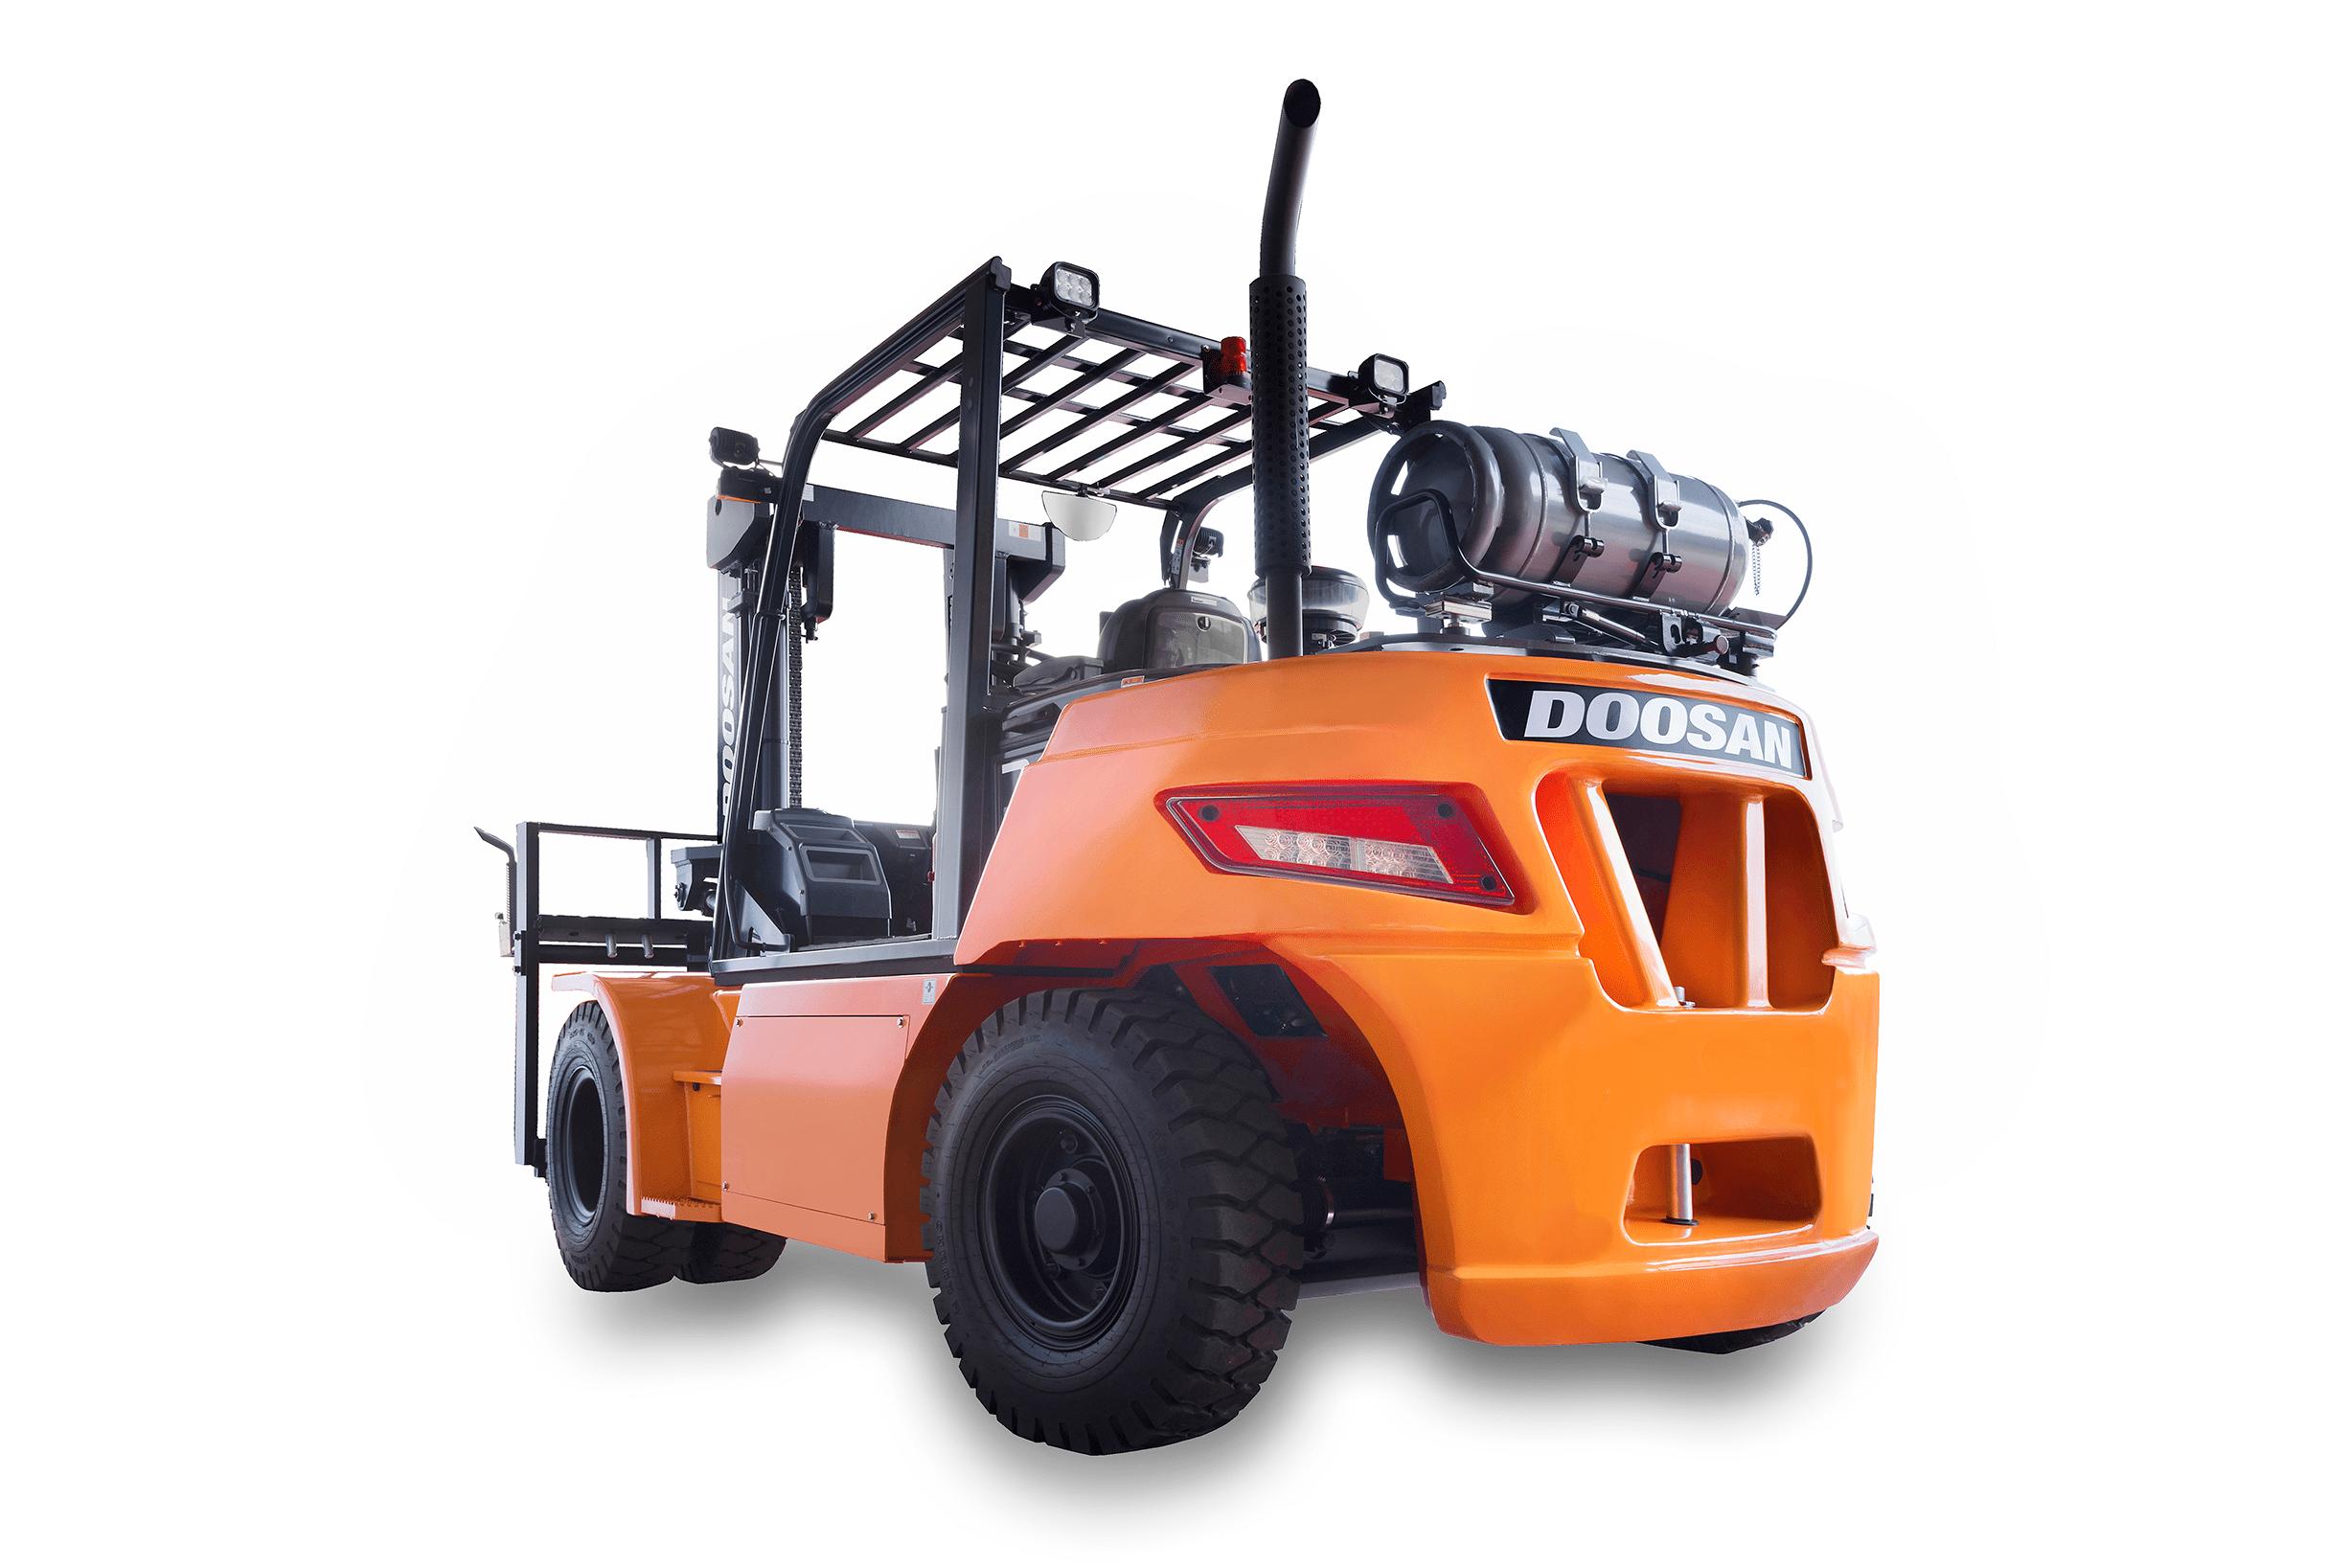 Doosan D70S-7 7.0 Tonne Diesel Powered Forklift Truck